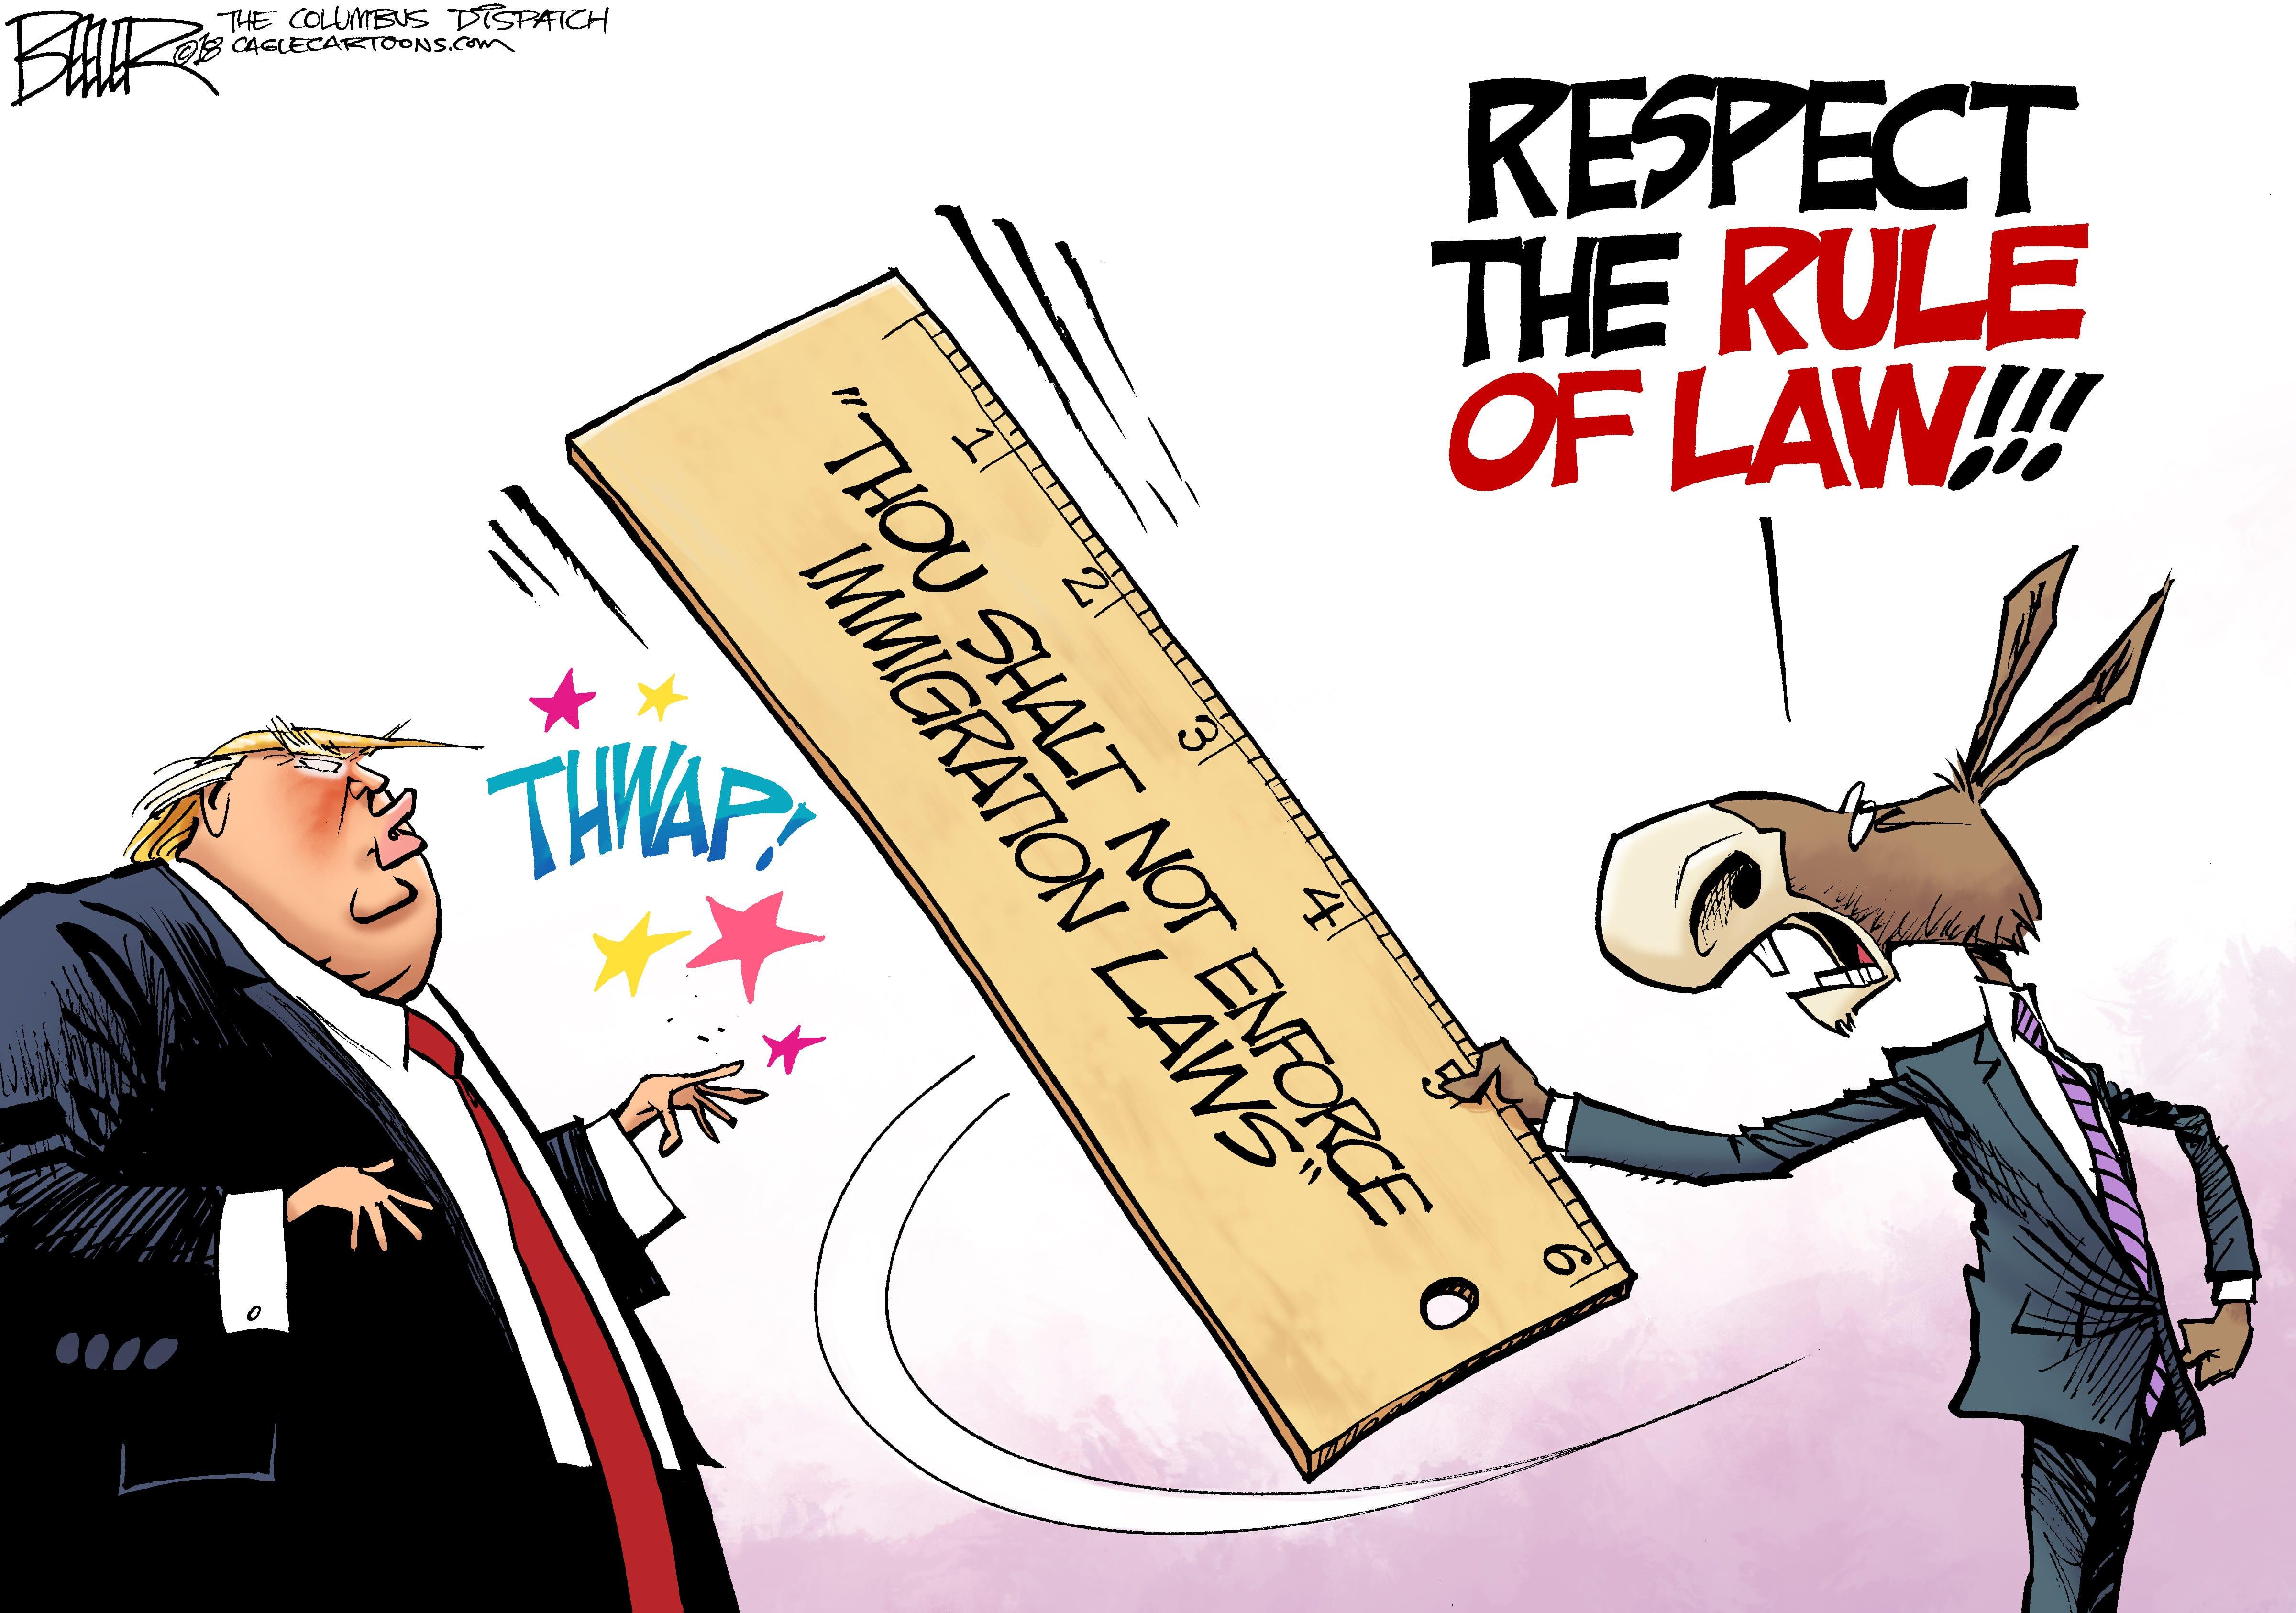 June 1: Rule Of Law